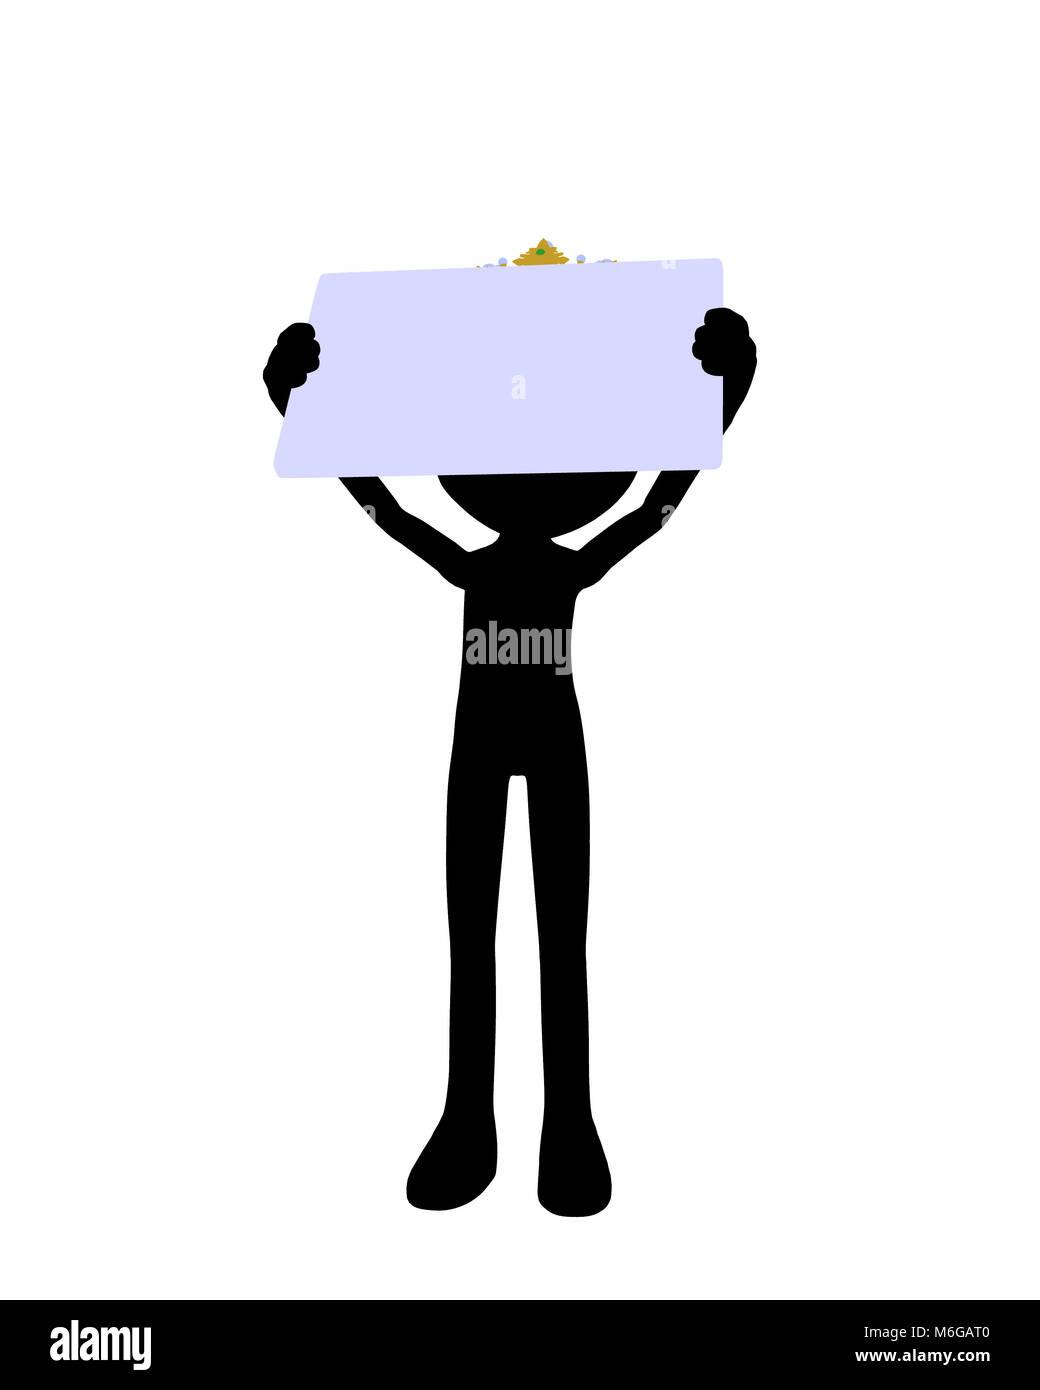 Cute black silhouette king guy holding a blank business card on a cute black silhouette king guy holding a blank business card on a white background colourmoves